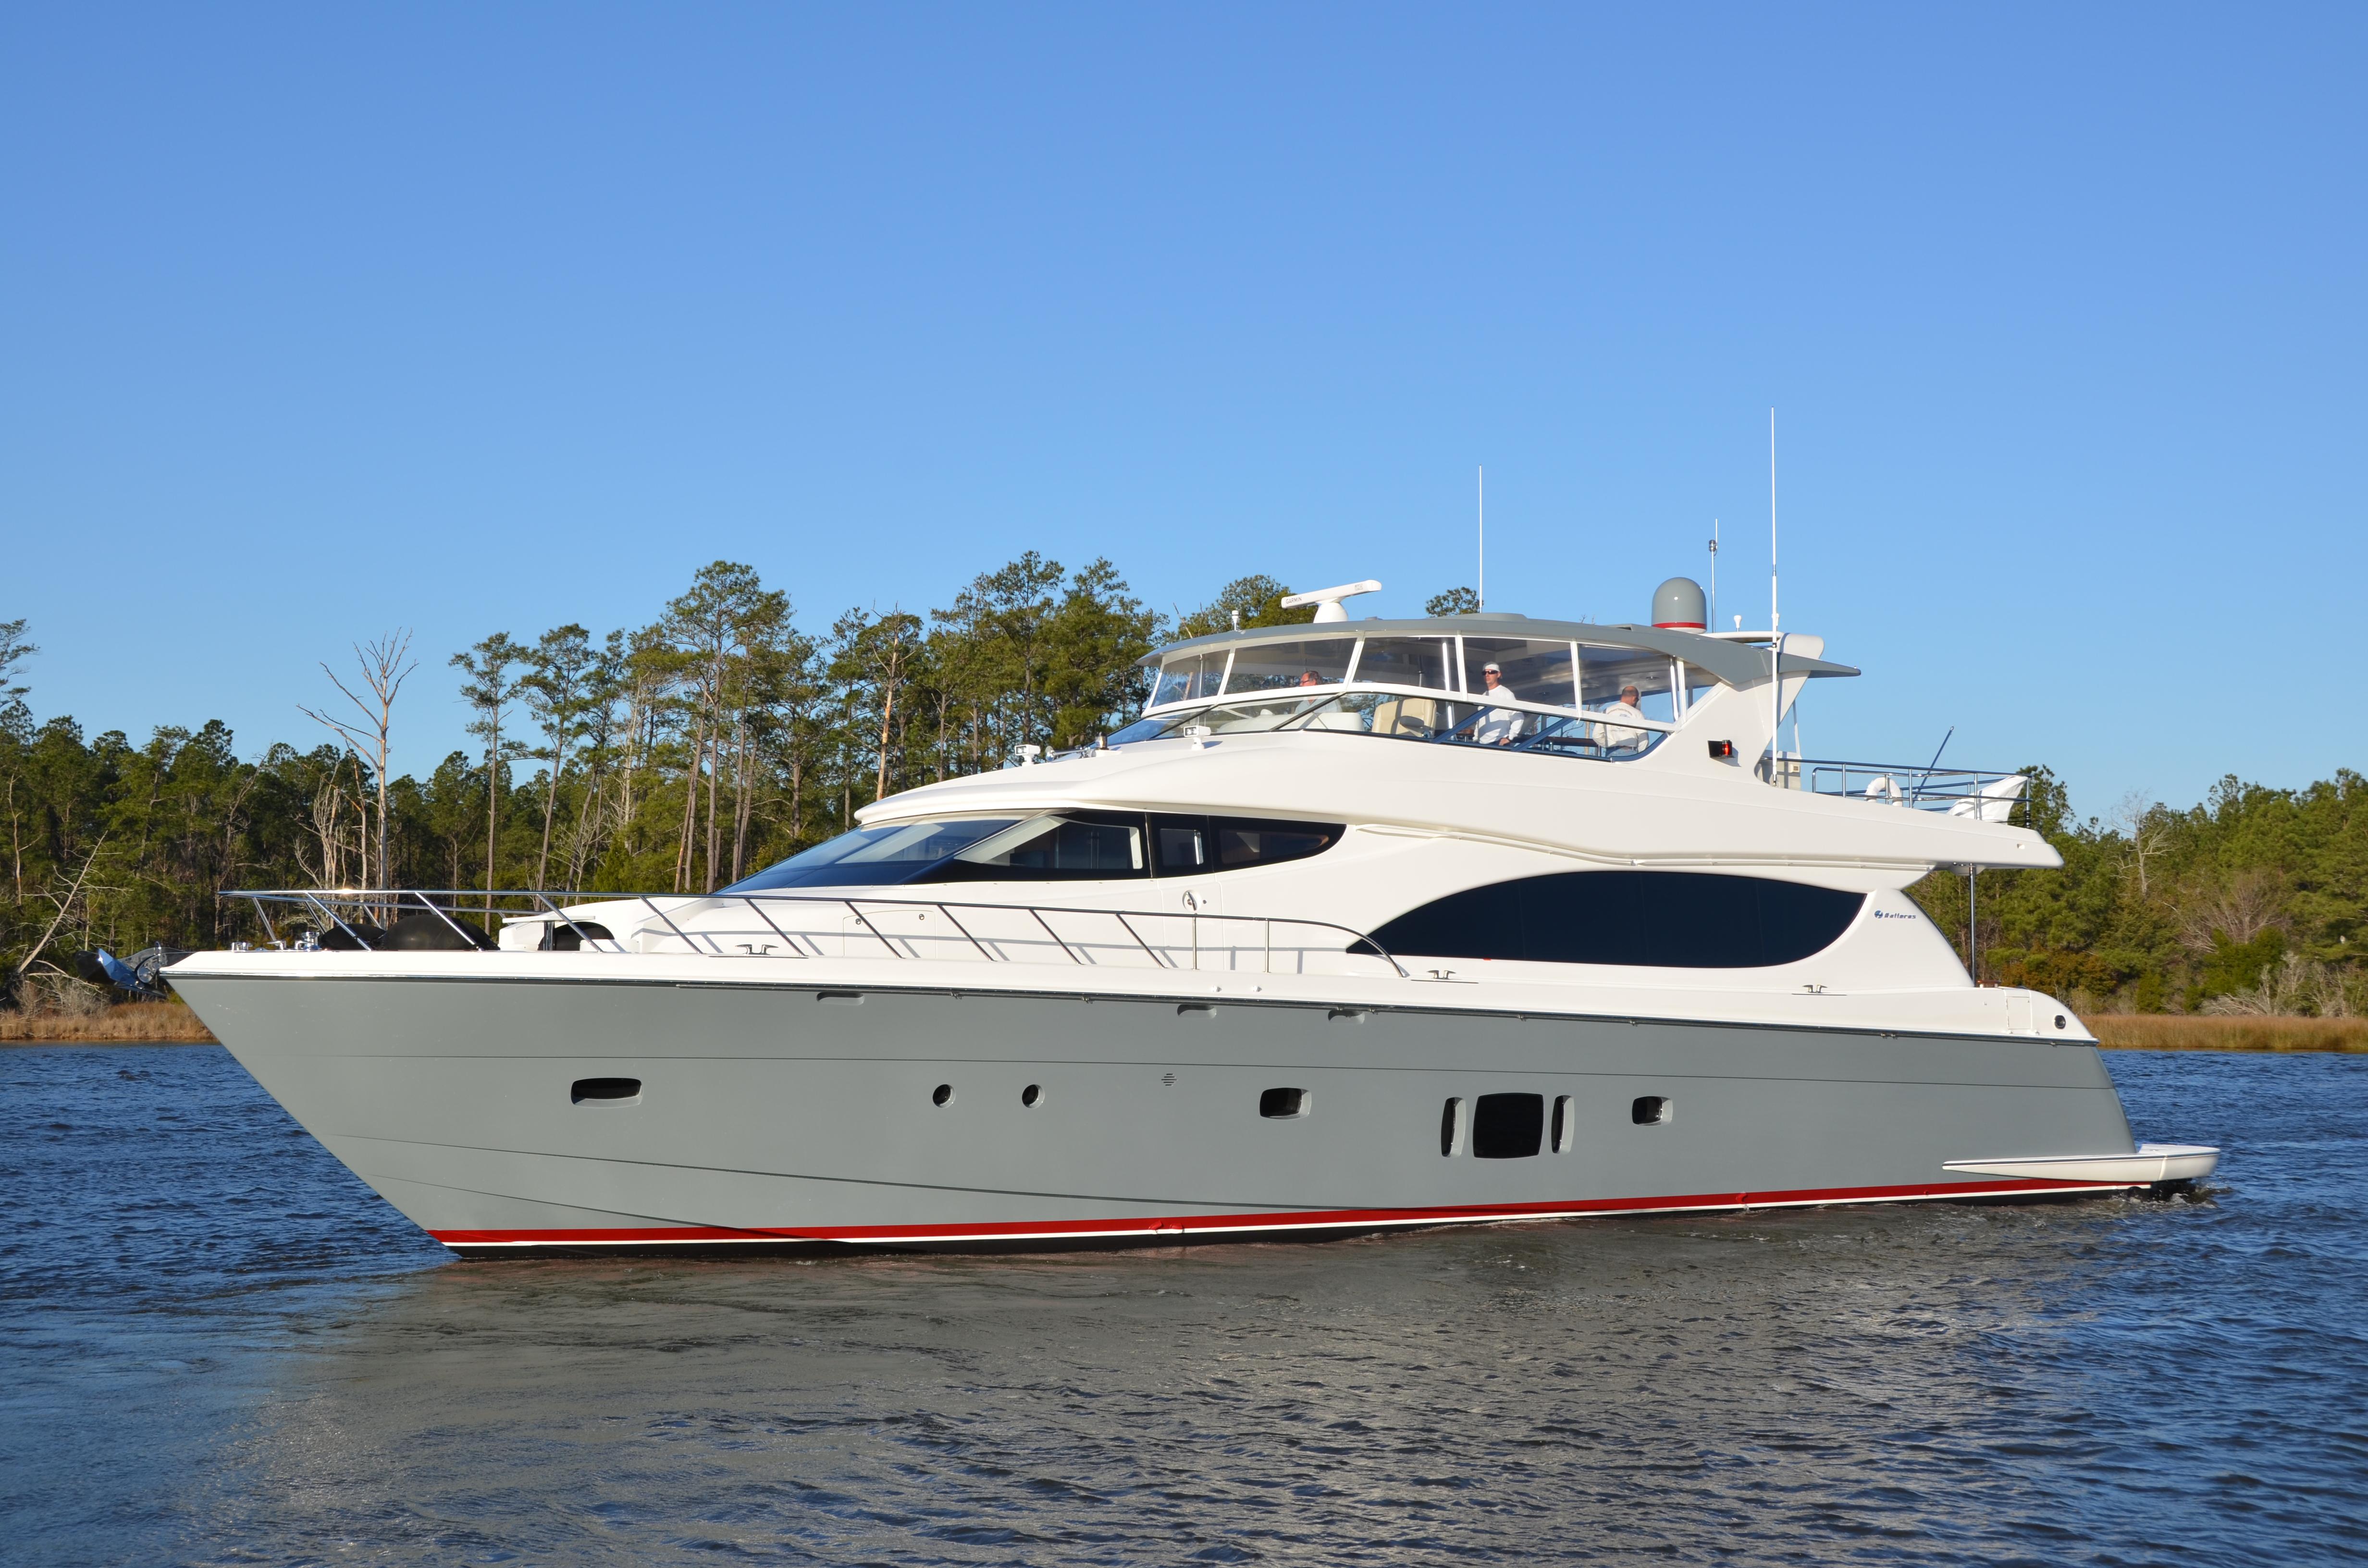 Hatteras 80 Foot Motoryacht Captain Ken Kreisler 39 S Boat